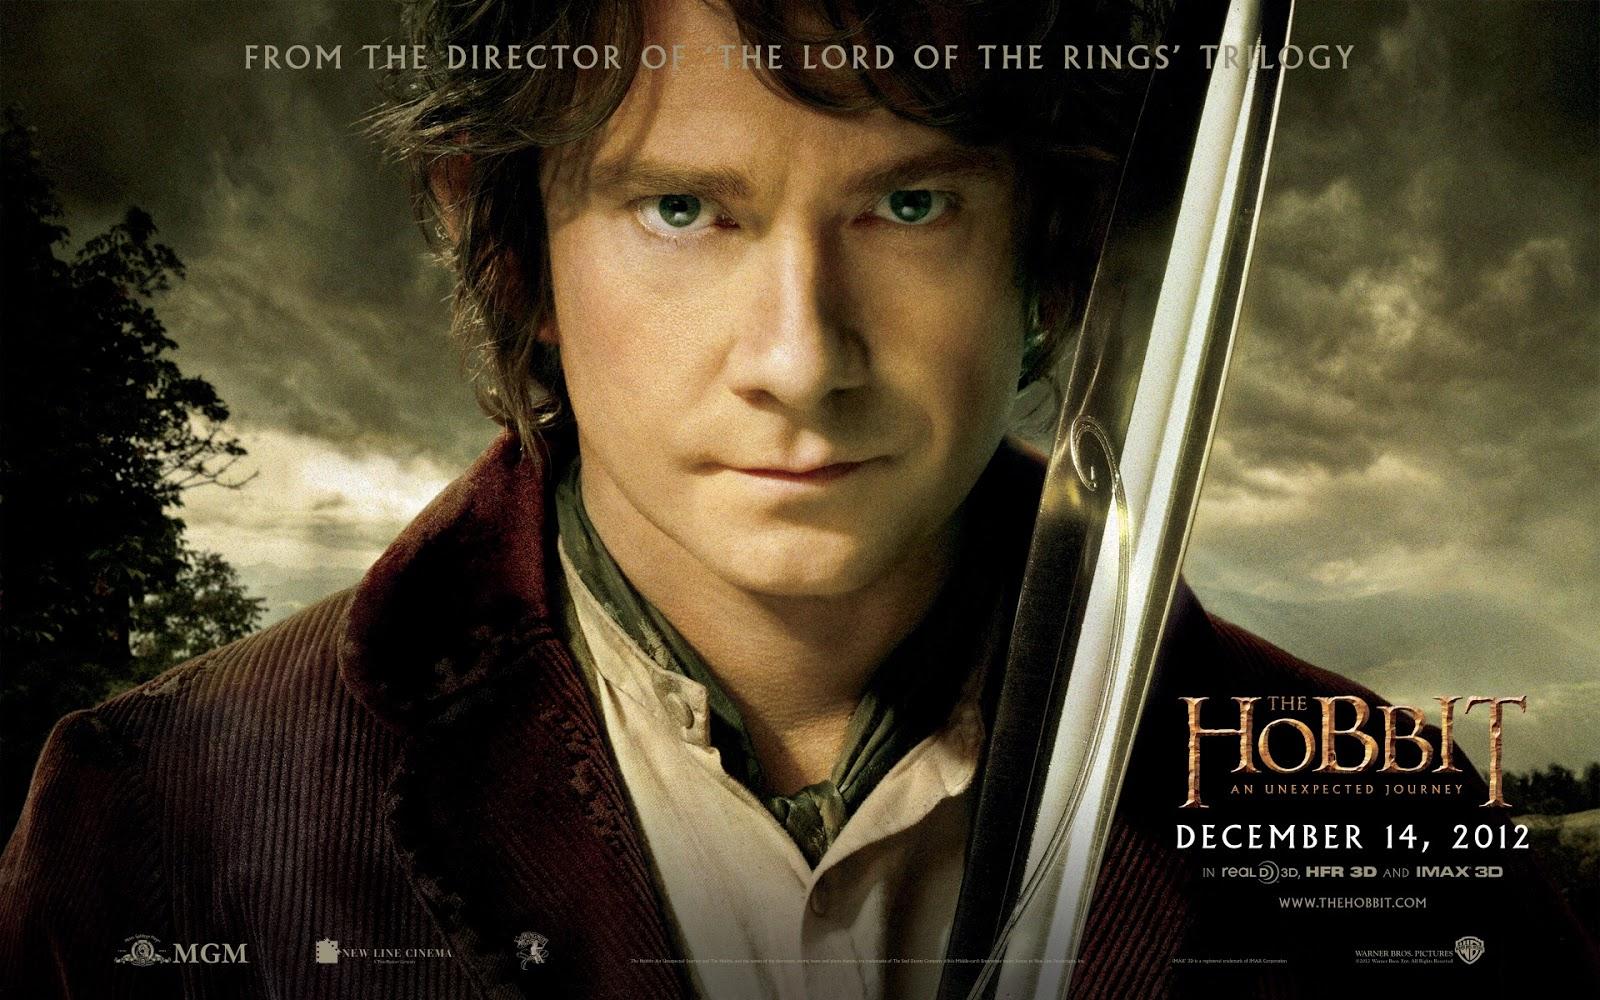 [wallpapers-papeis-de-parede-filme-hobbit-desbaratinando%2520%25281%2529%255B2%255D.jpg]